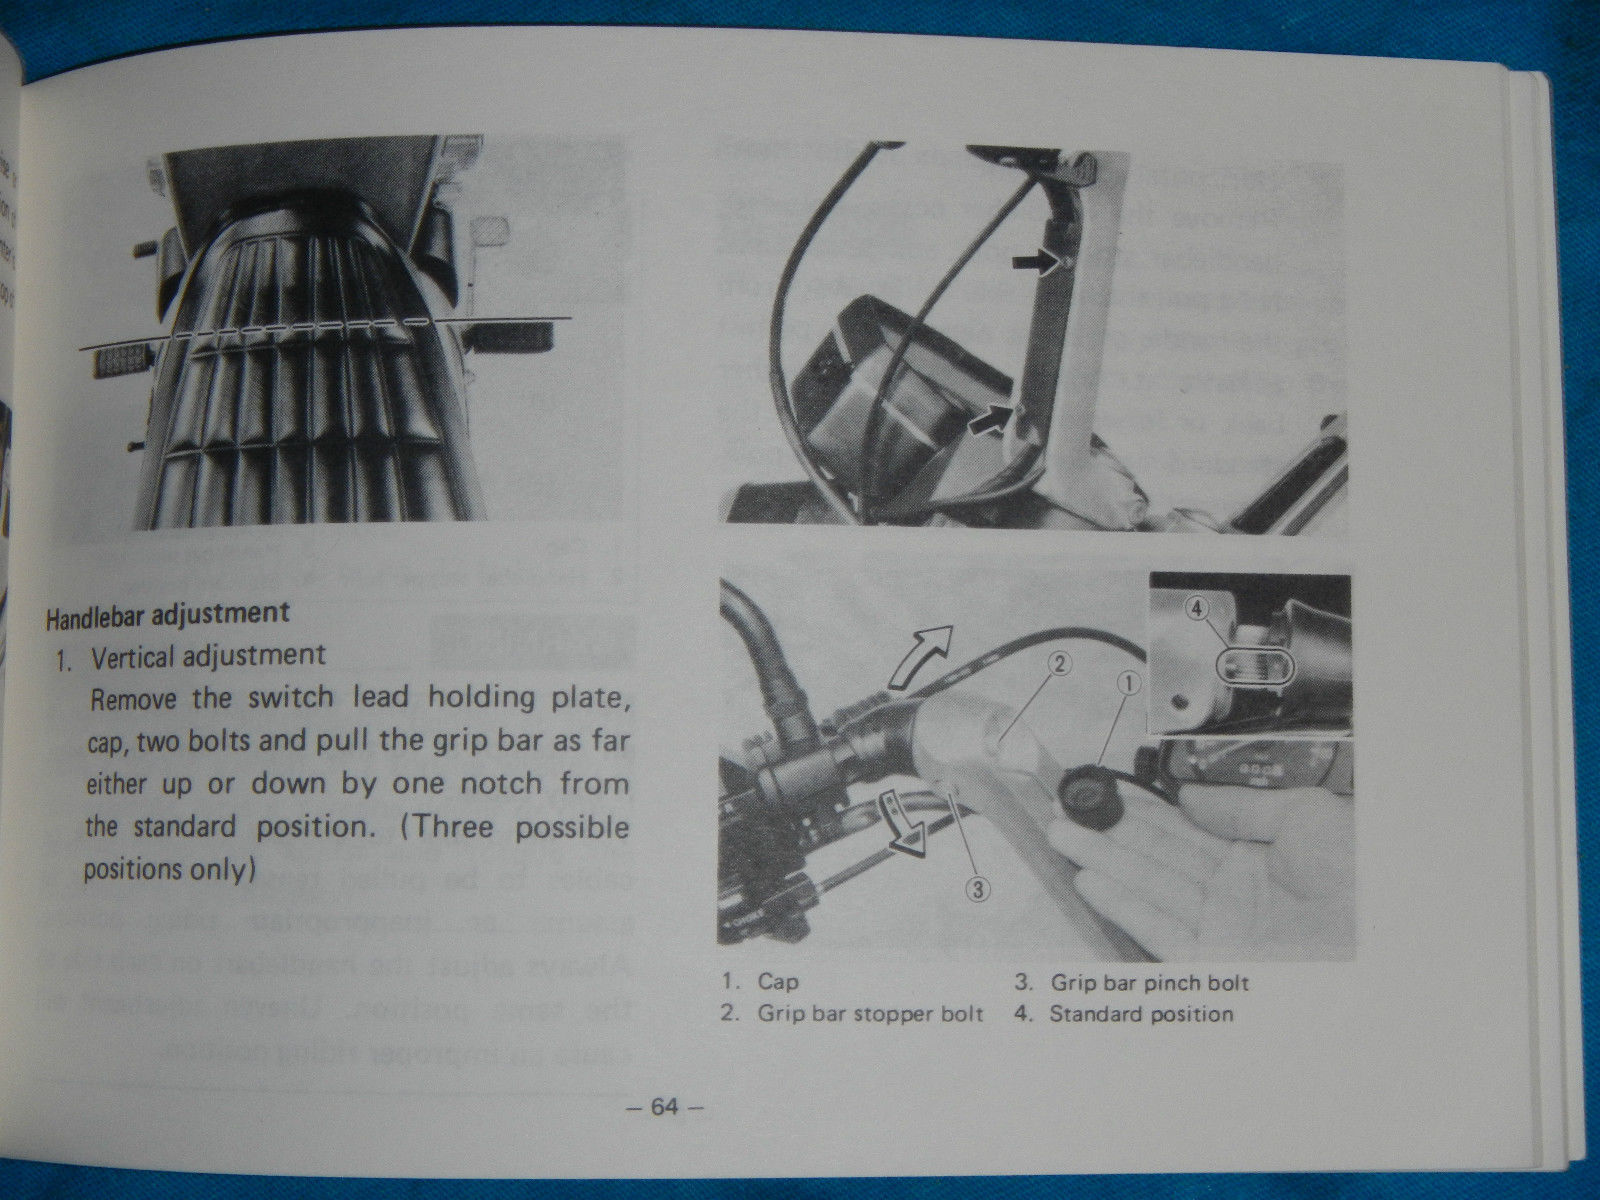 yamaha szr 660 1995 manual de reparatie www manualedereparatie Array - 1982  82 yamaha xj750 xj 750 maxim shop and similar items rh bonanza com